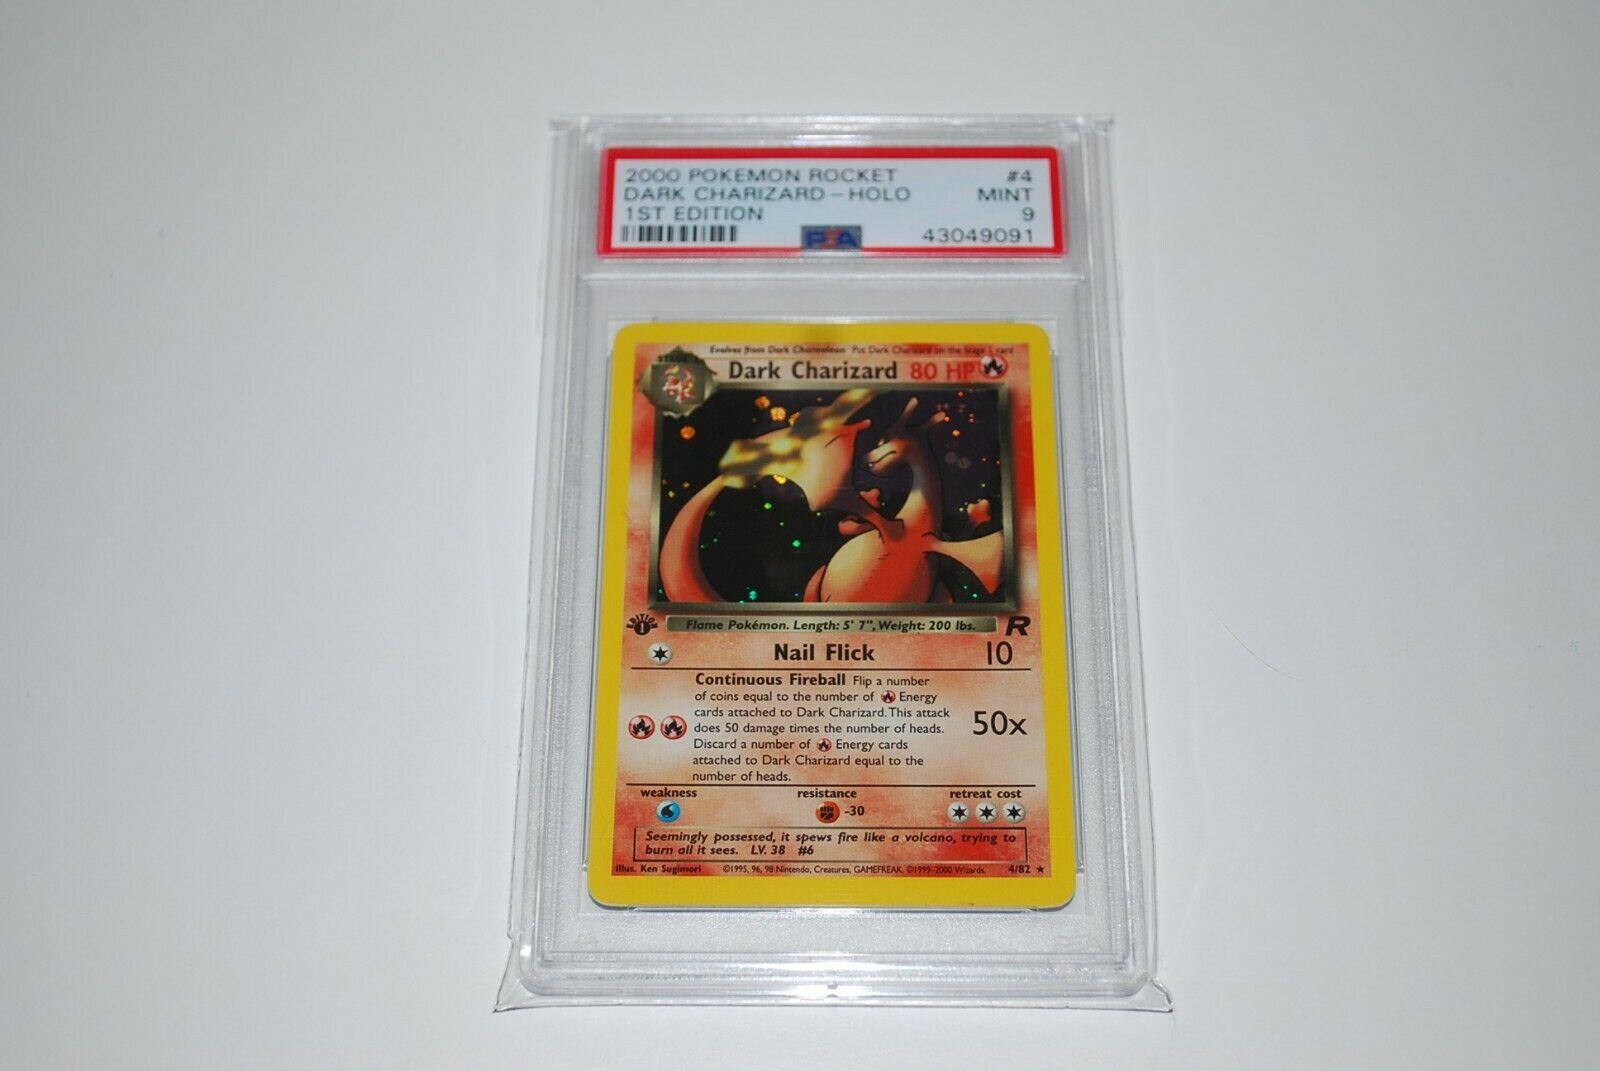 PSA 9 Mint 1st Edition Dark Charizard Holo 482 Pokemon Card 19992000